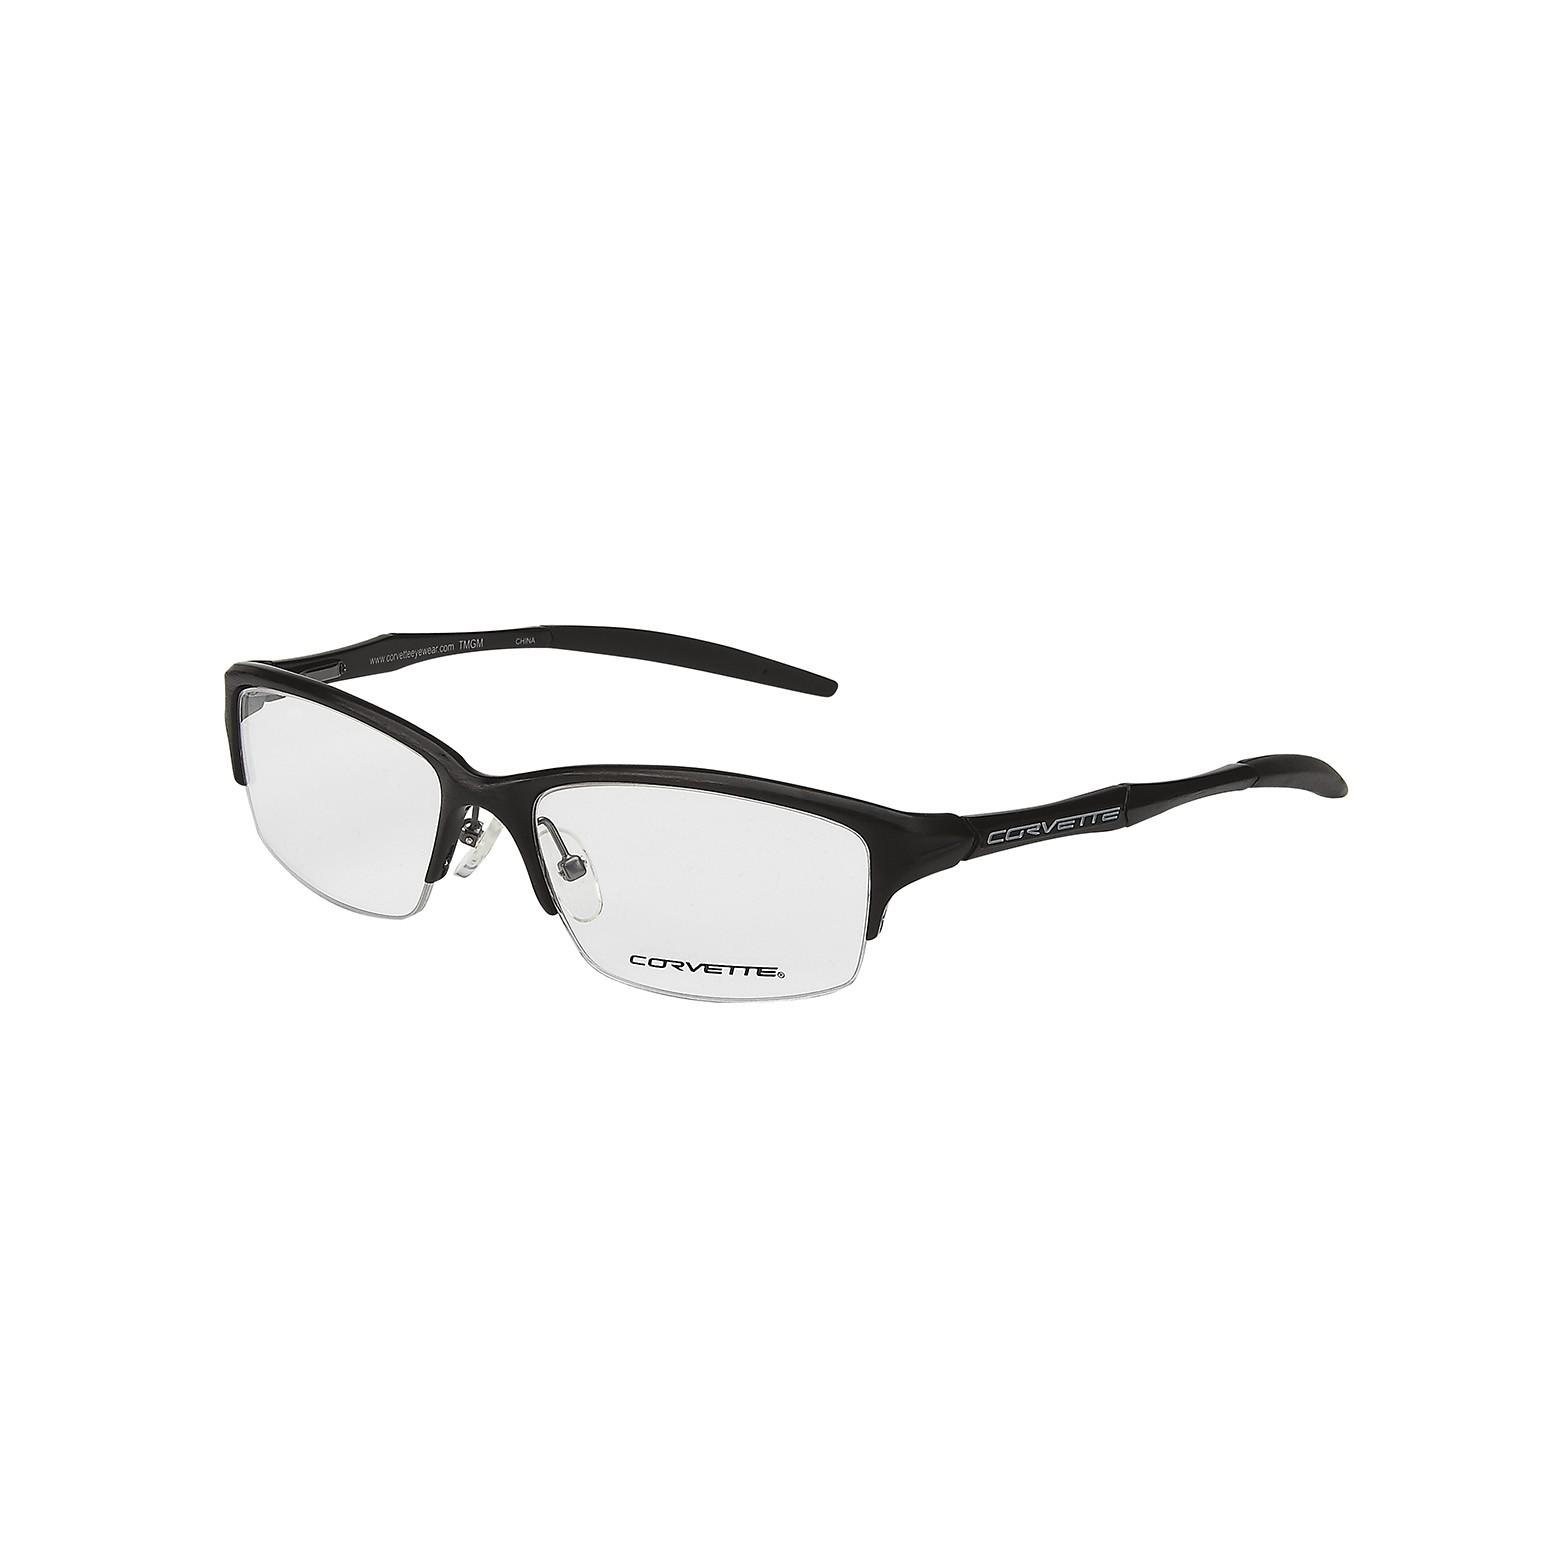 C 1aofrmb Corvette Eyewear Sunglasses And Accessories